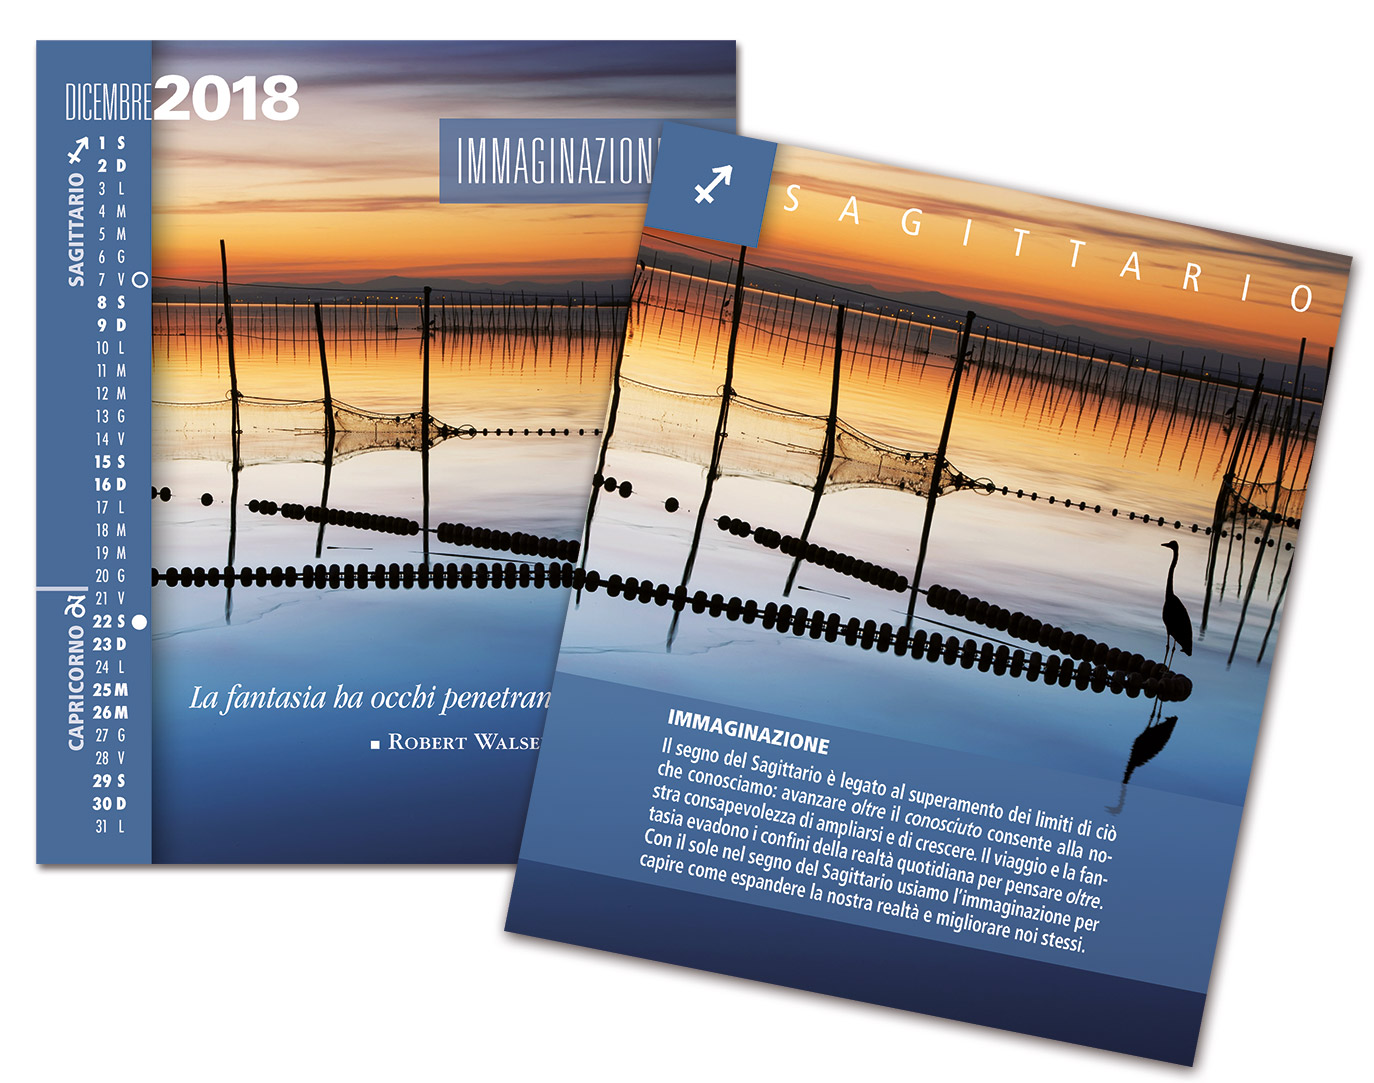 Calendario 2018 SegniSimboliParole Dicembre